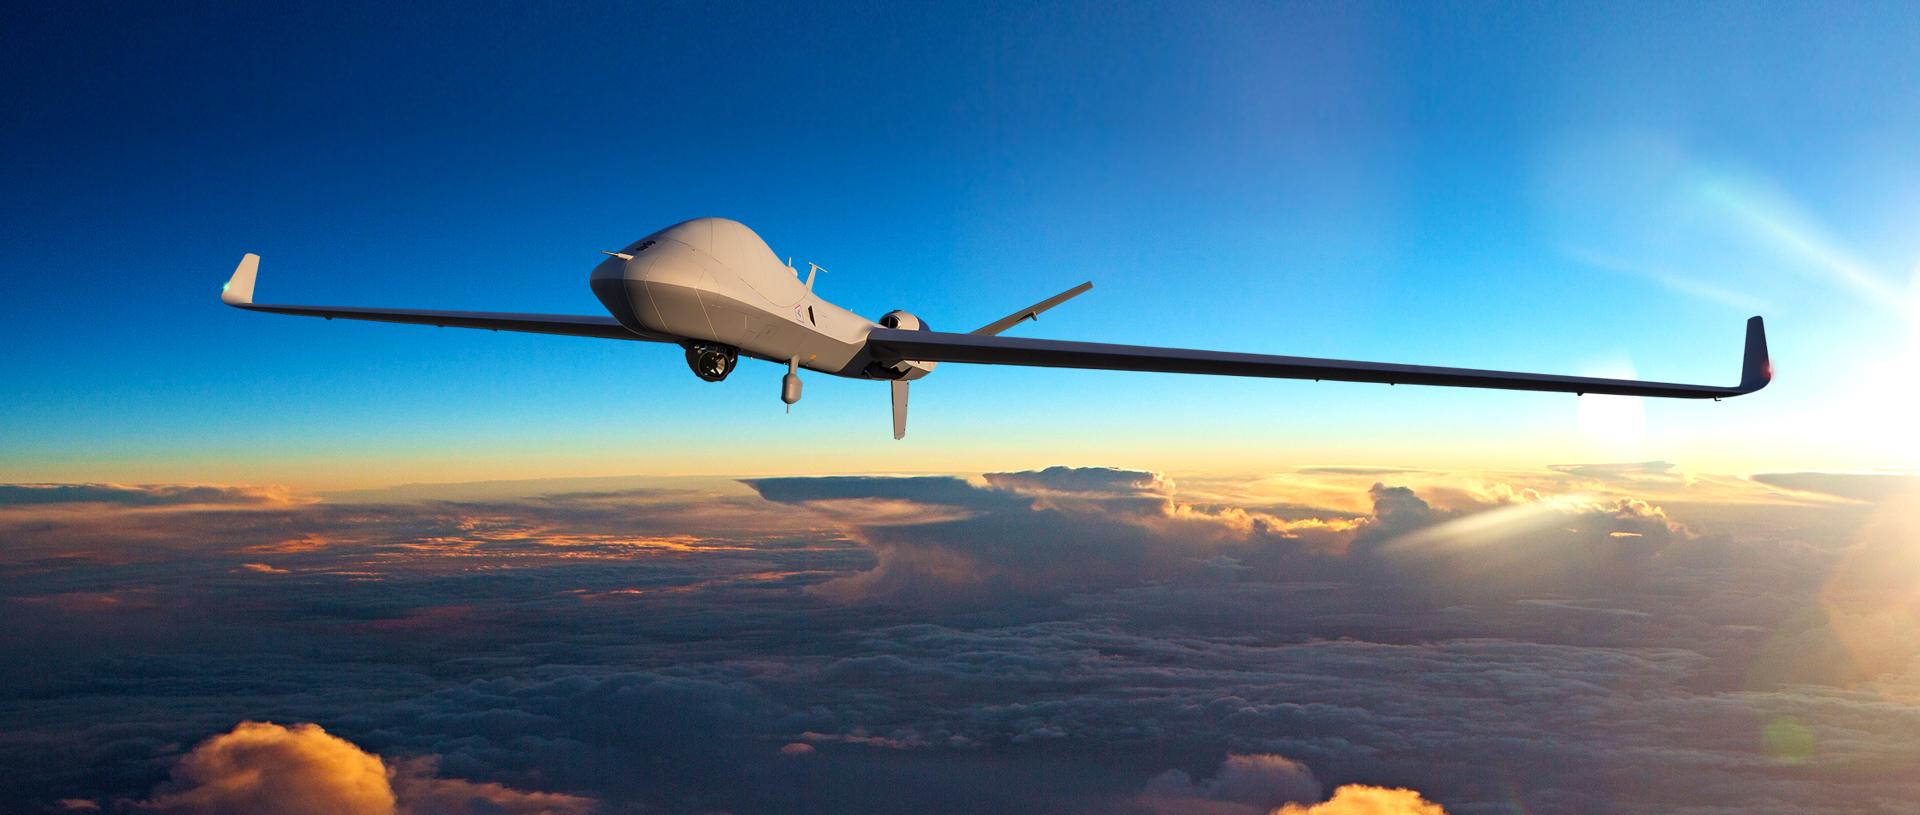 GA-ASI's SkyGuardian RPA takes to the sky. Photo via GA-ASI.